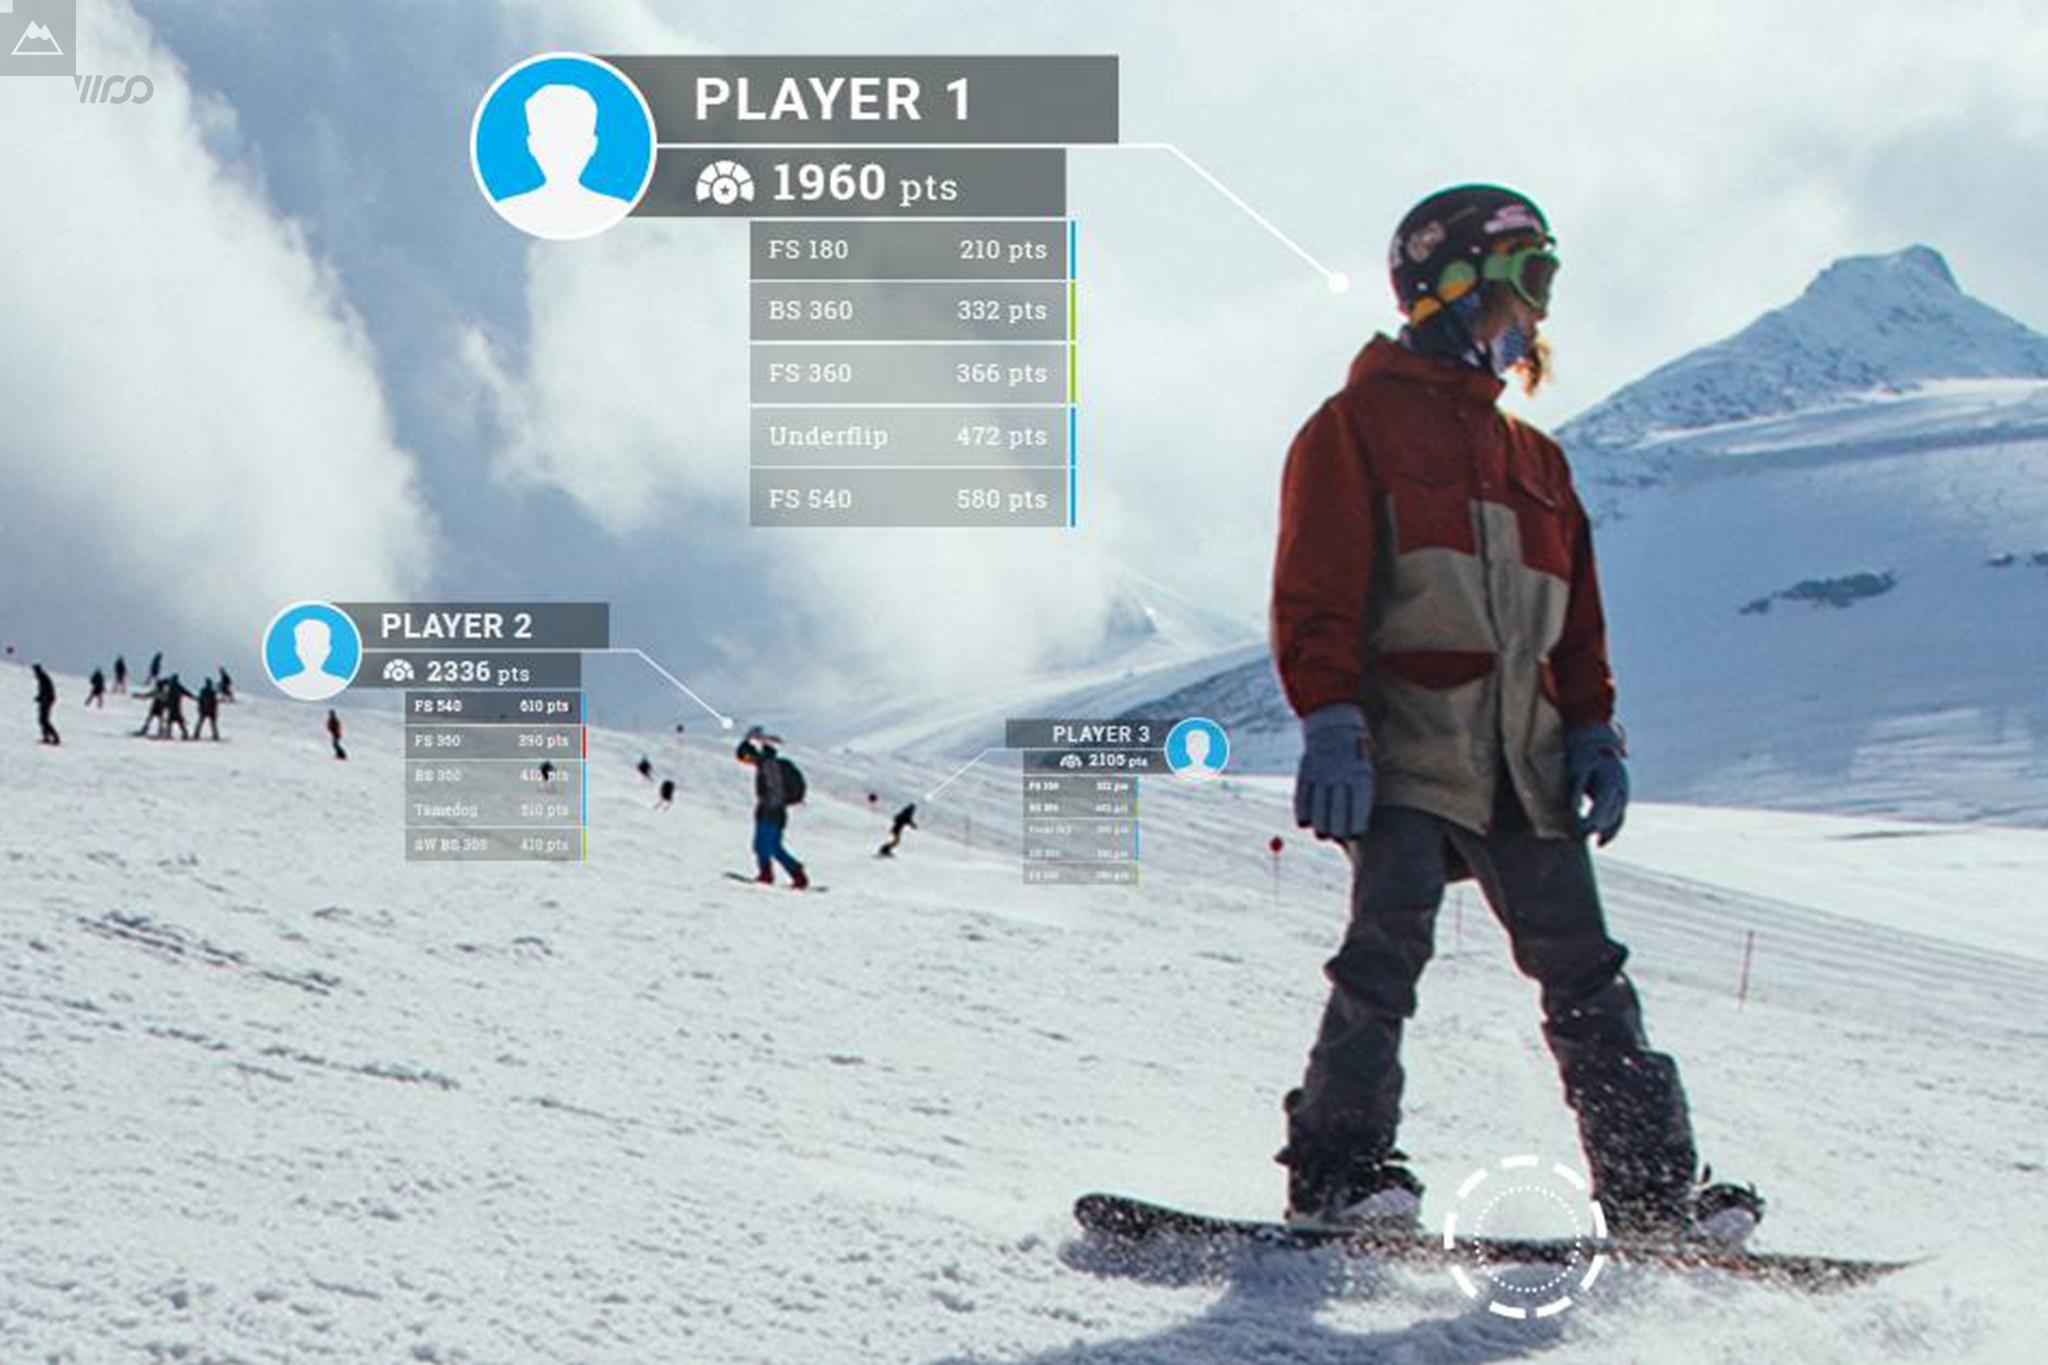 woo_snow_multiplayer_2048.jpg